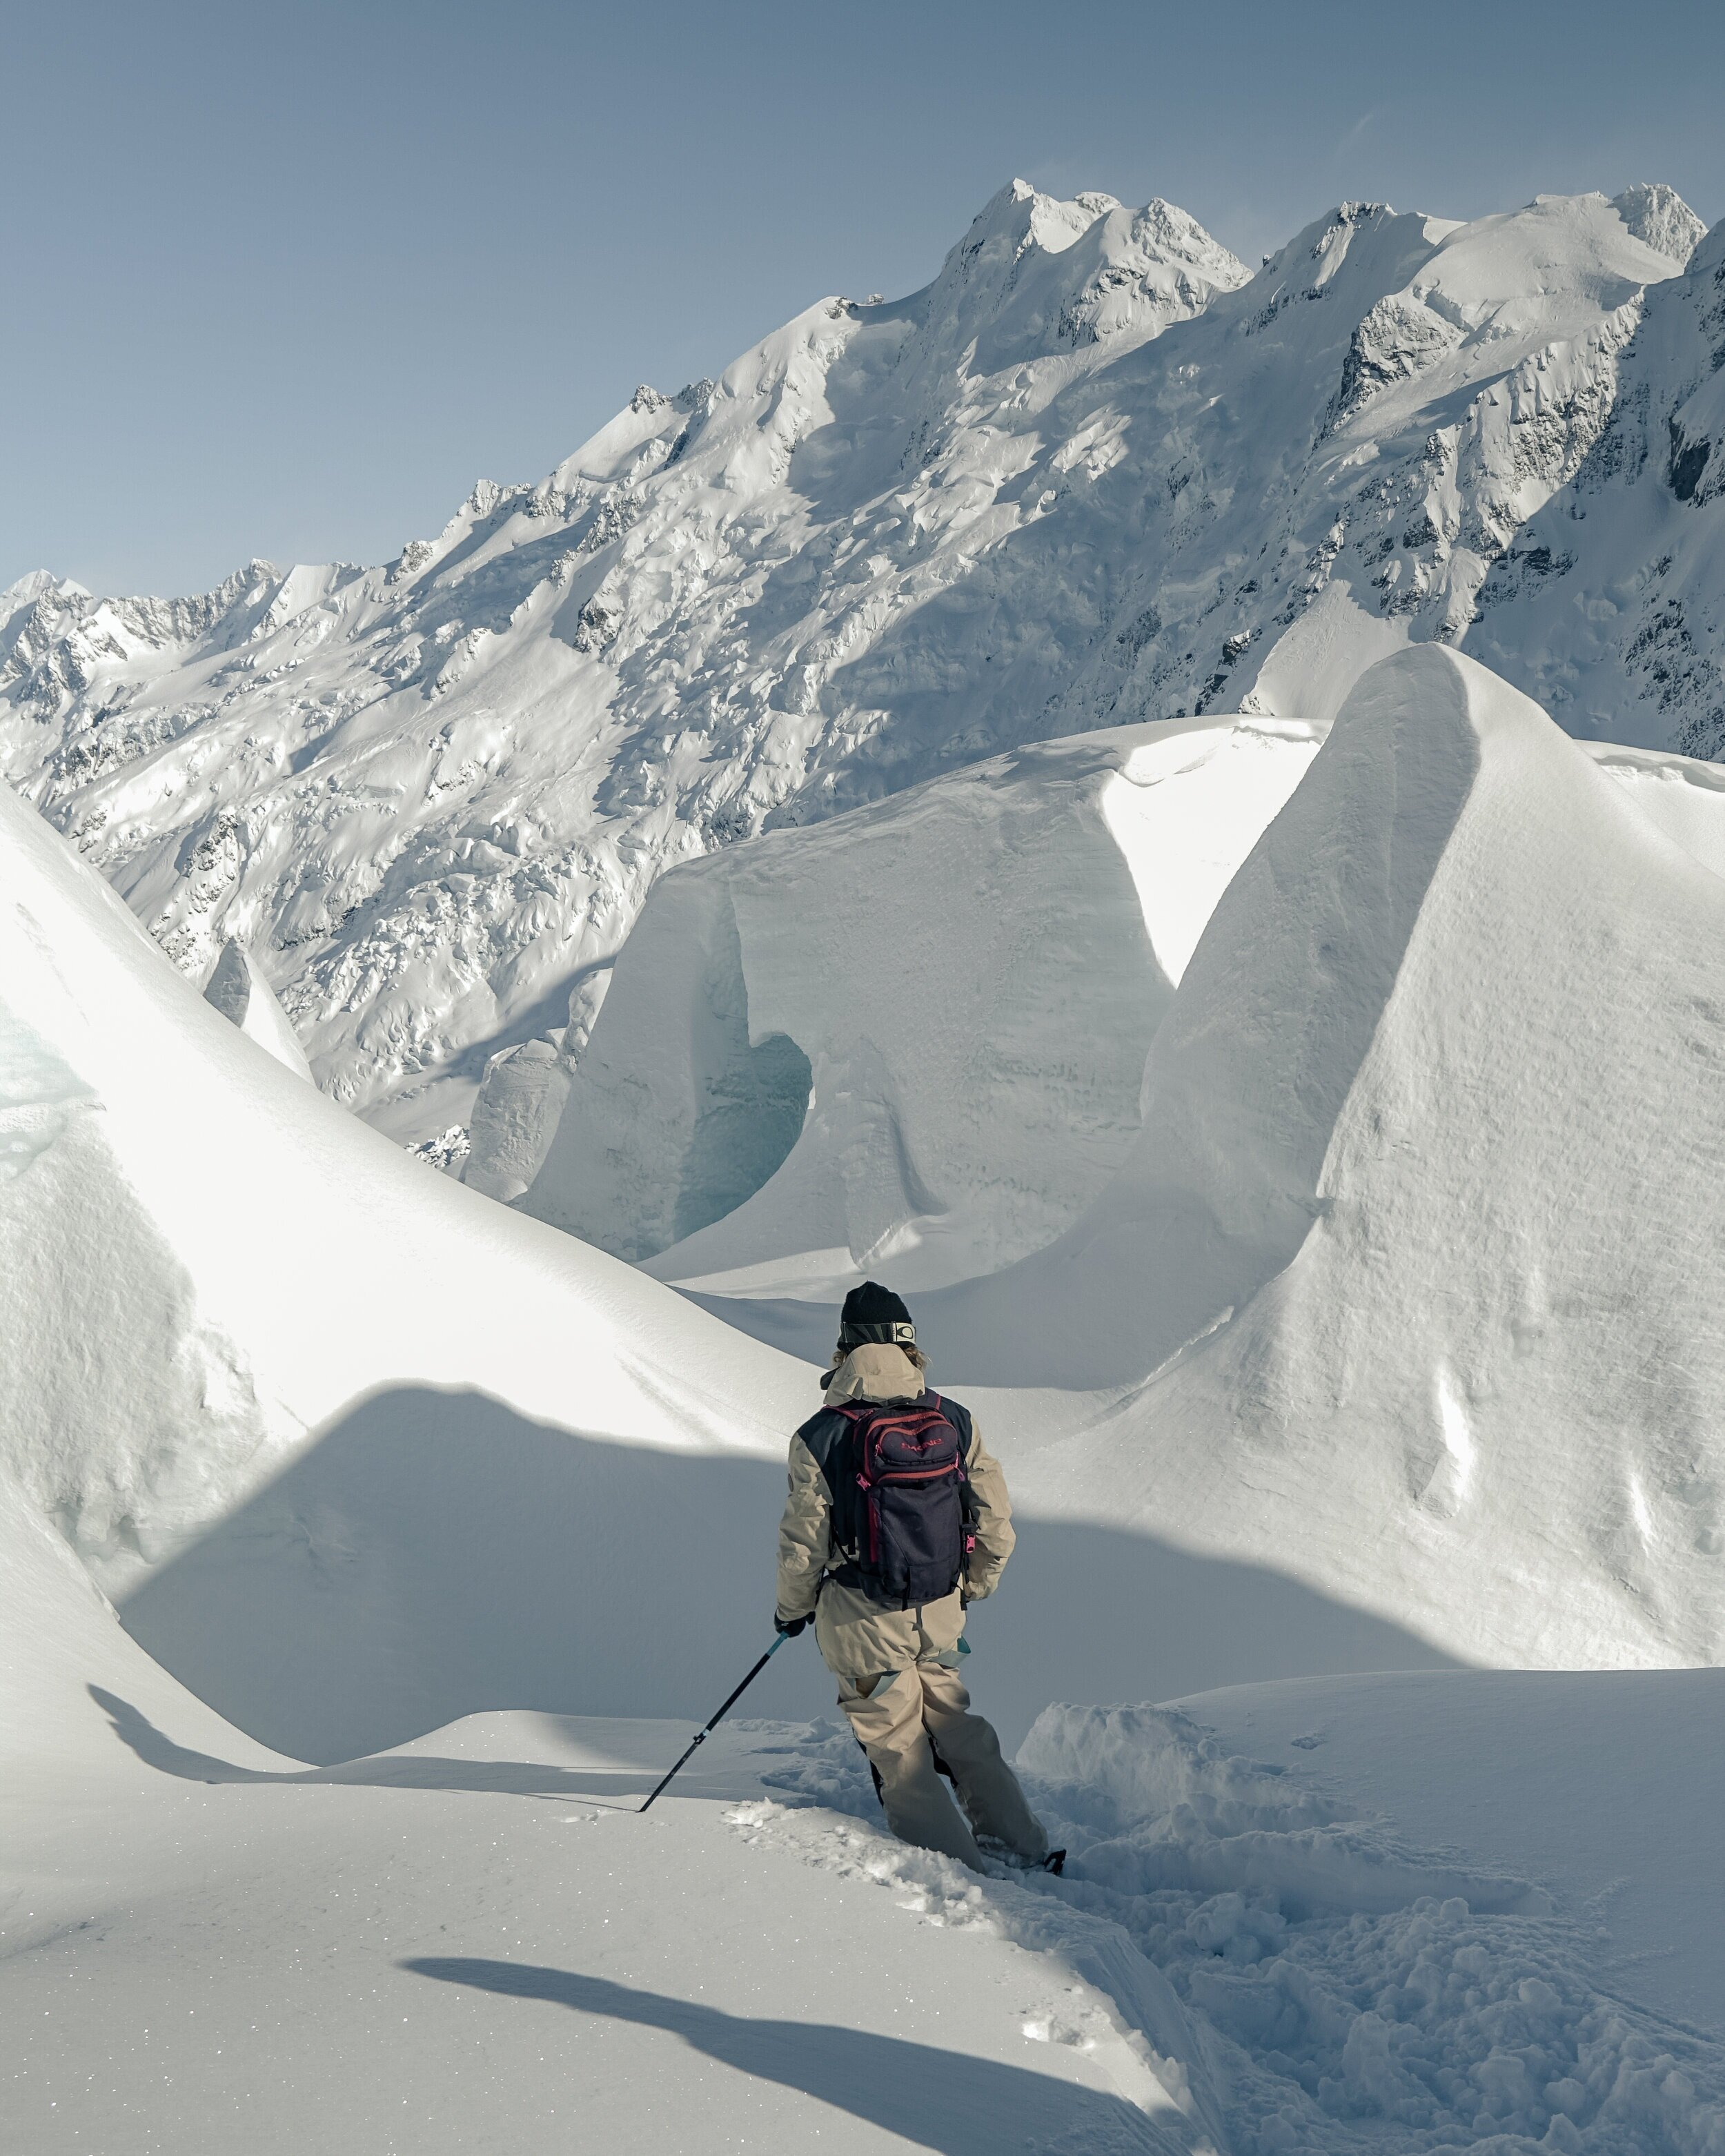 Mabey+Ski_New+Zealand_Mt+Cook+Ski+Planes+and+Helicopters_Ski+The+Tasman_6.jpg